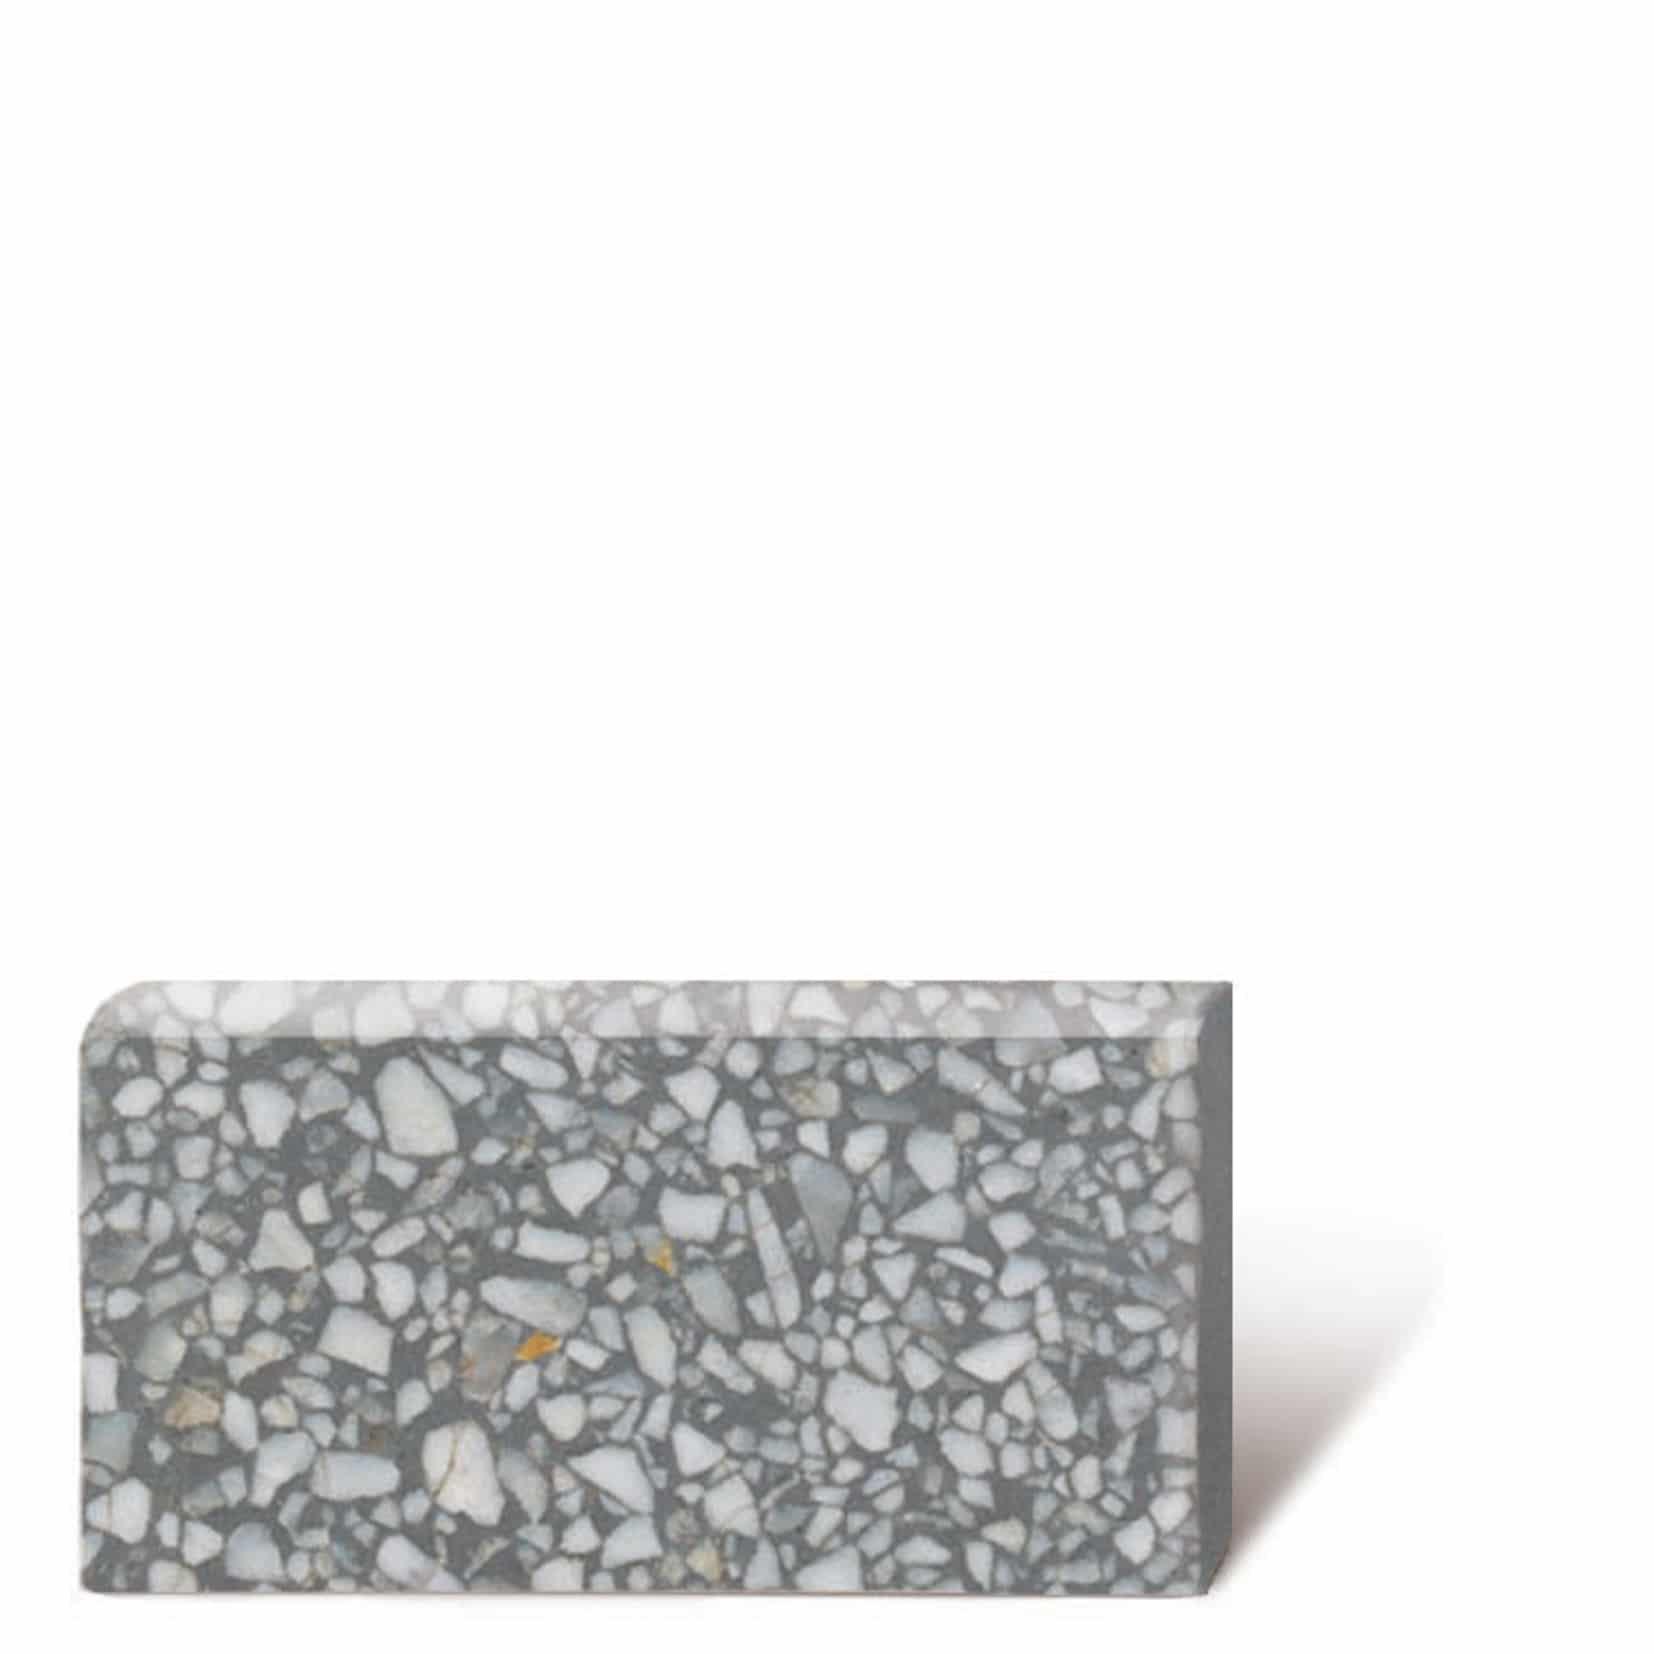 N° 900054w - Sockel Terrazzo GROB